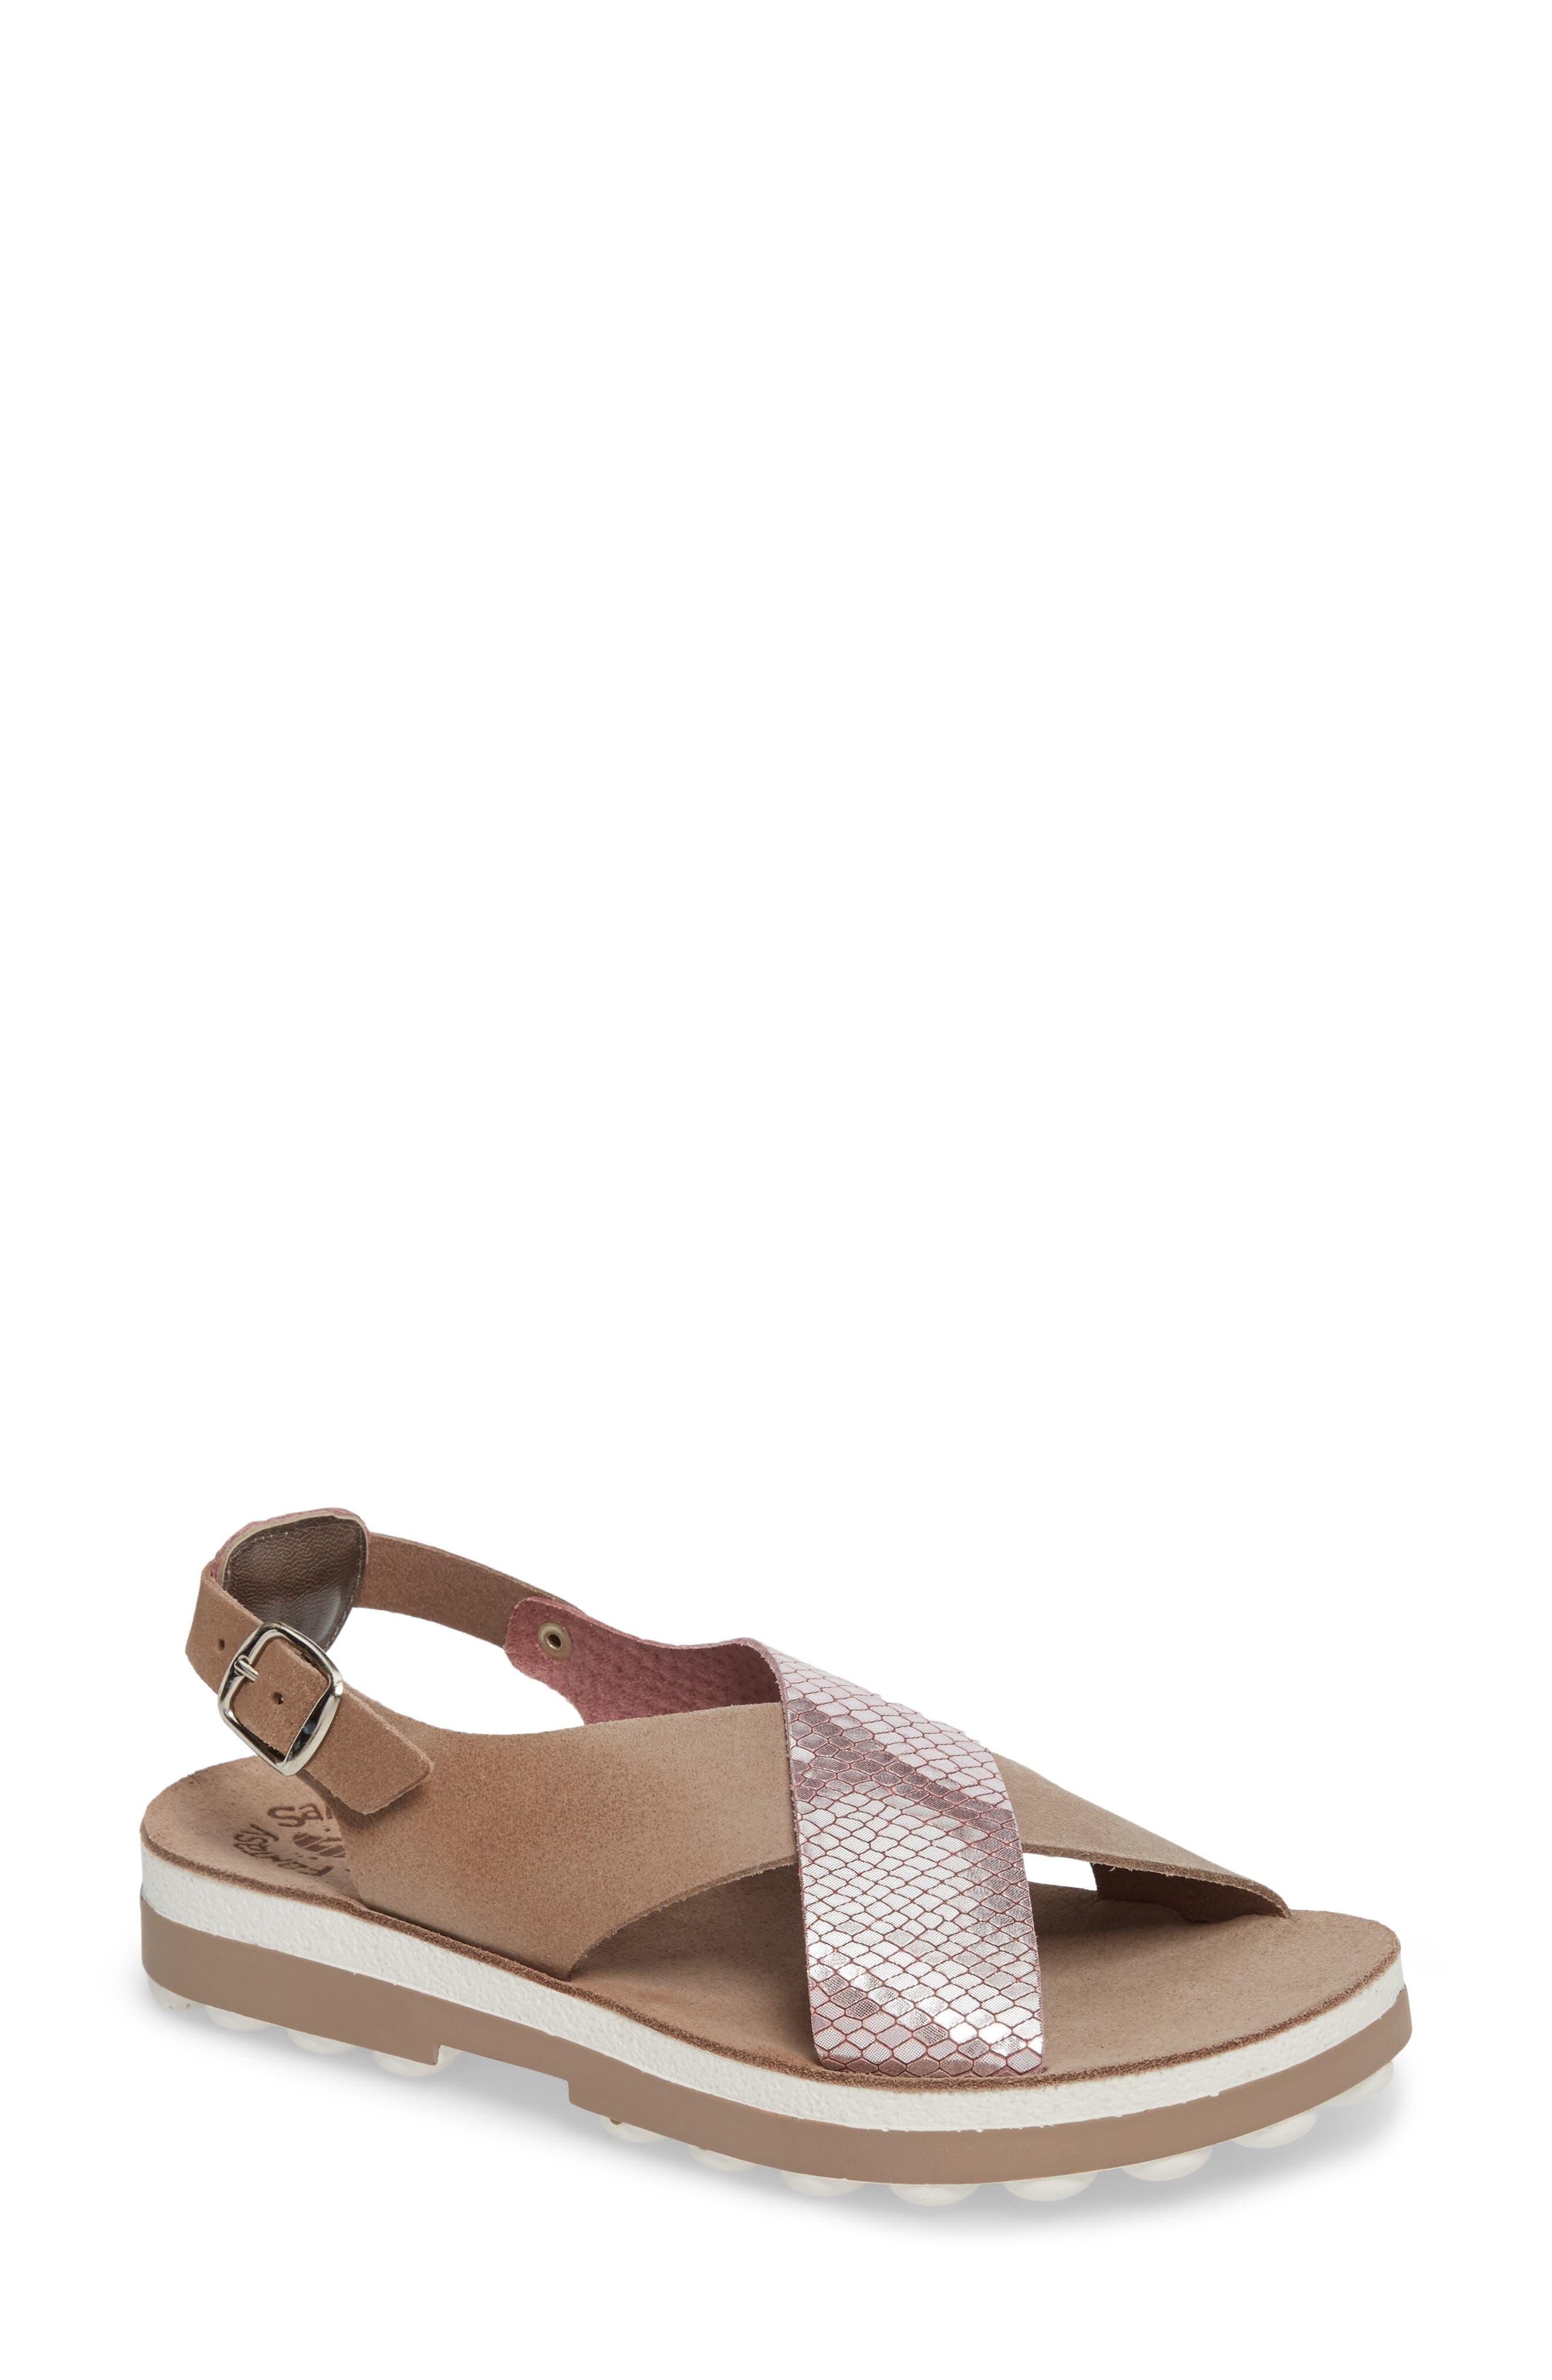 Izabella Fantasy Platform Sandal,                             Main thumbnail 1, color,                             Coffee Snake Leather